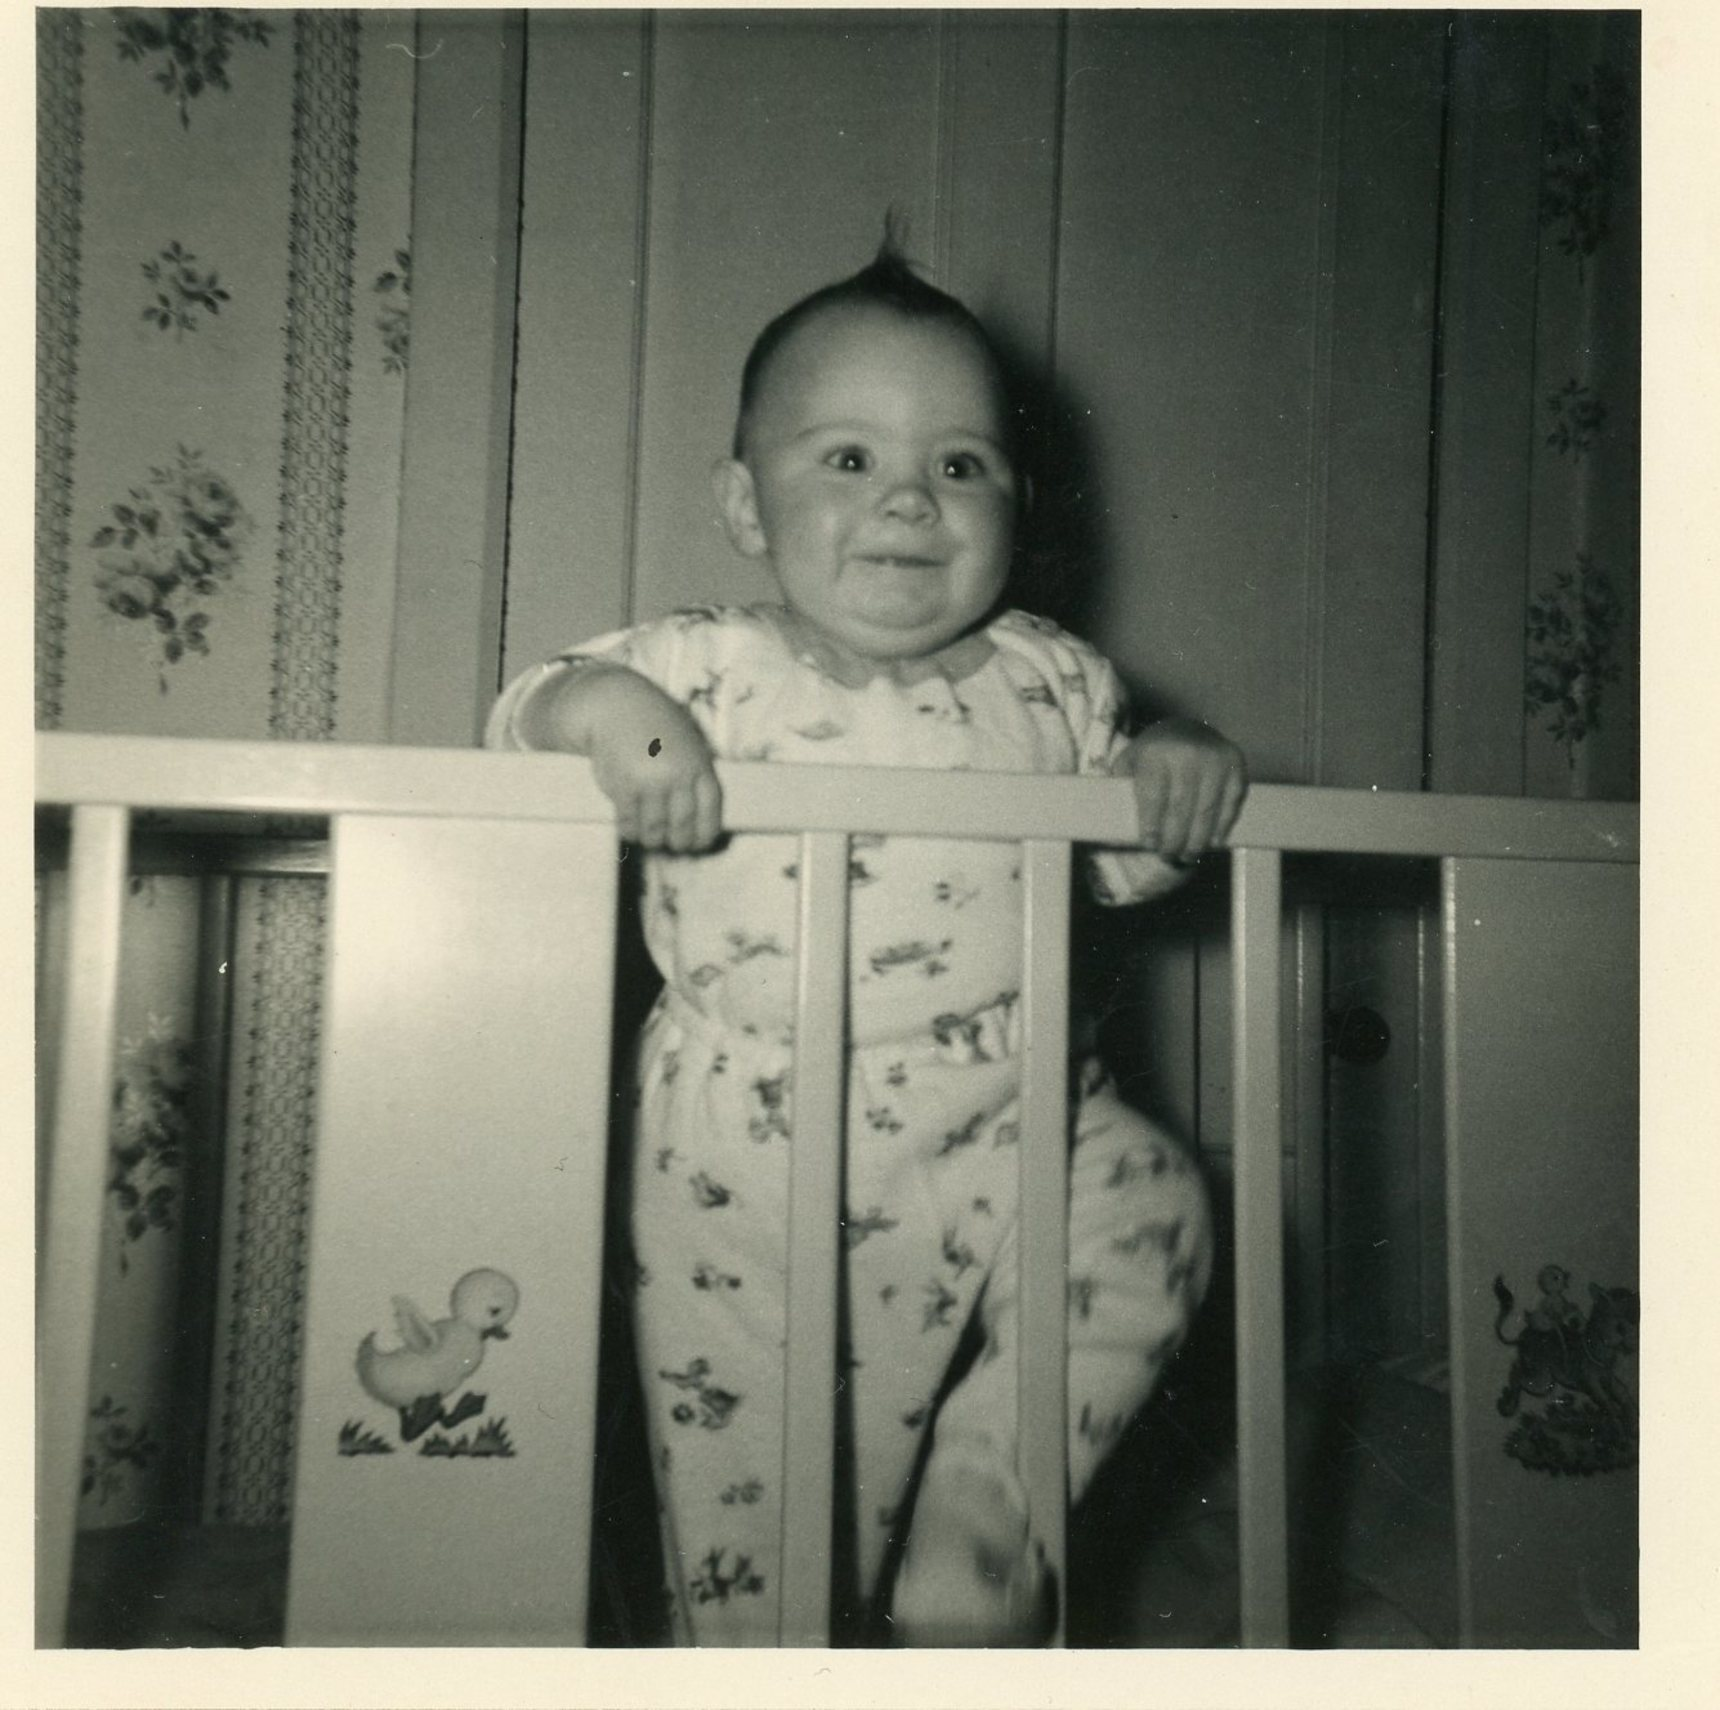 Baby in cot, Oxgangs